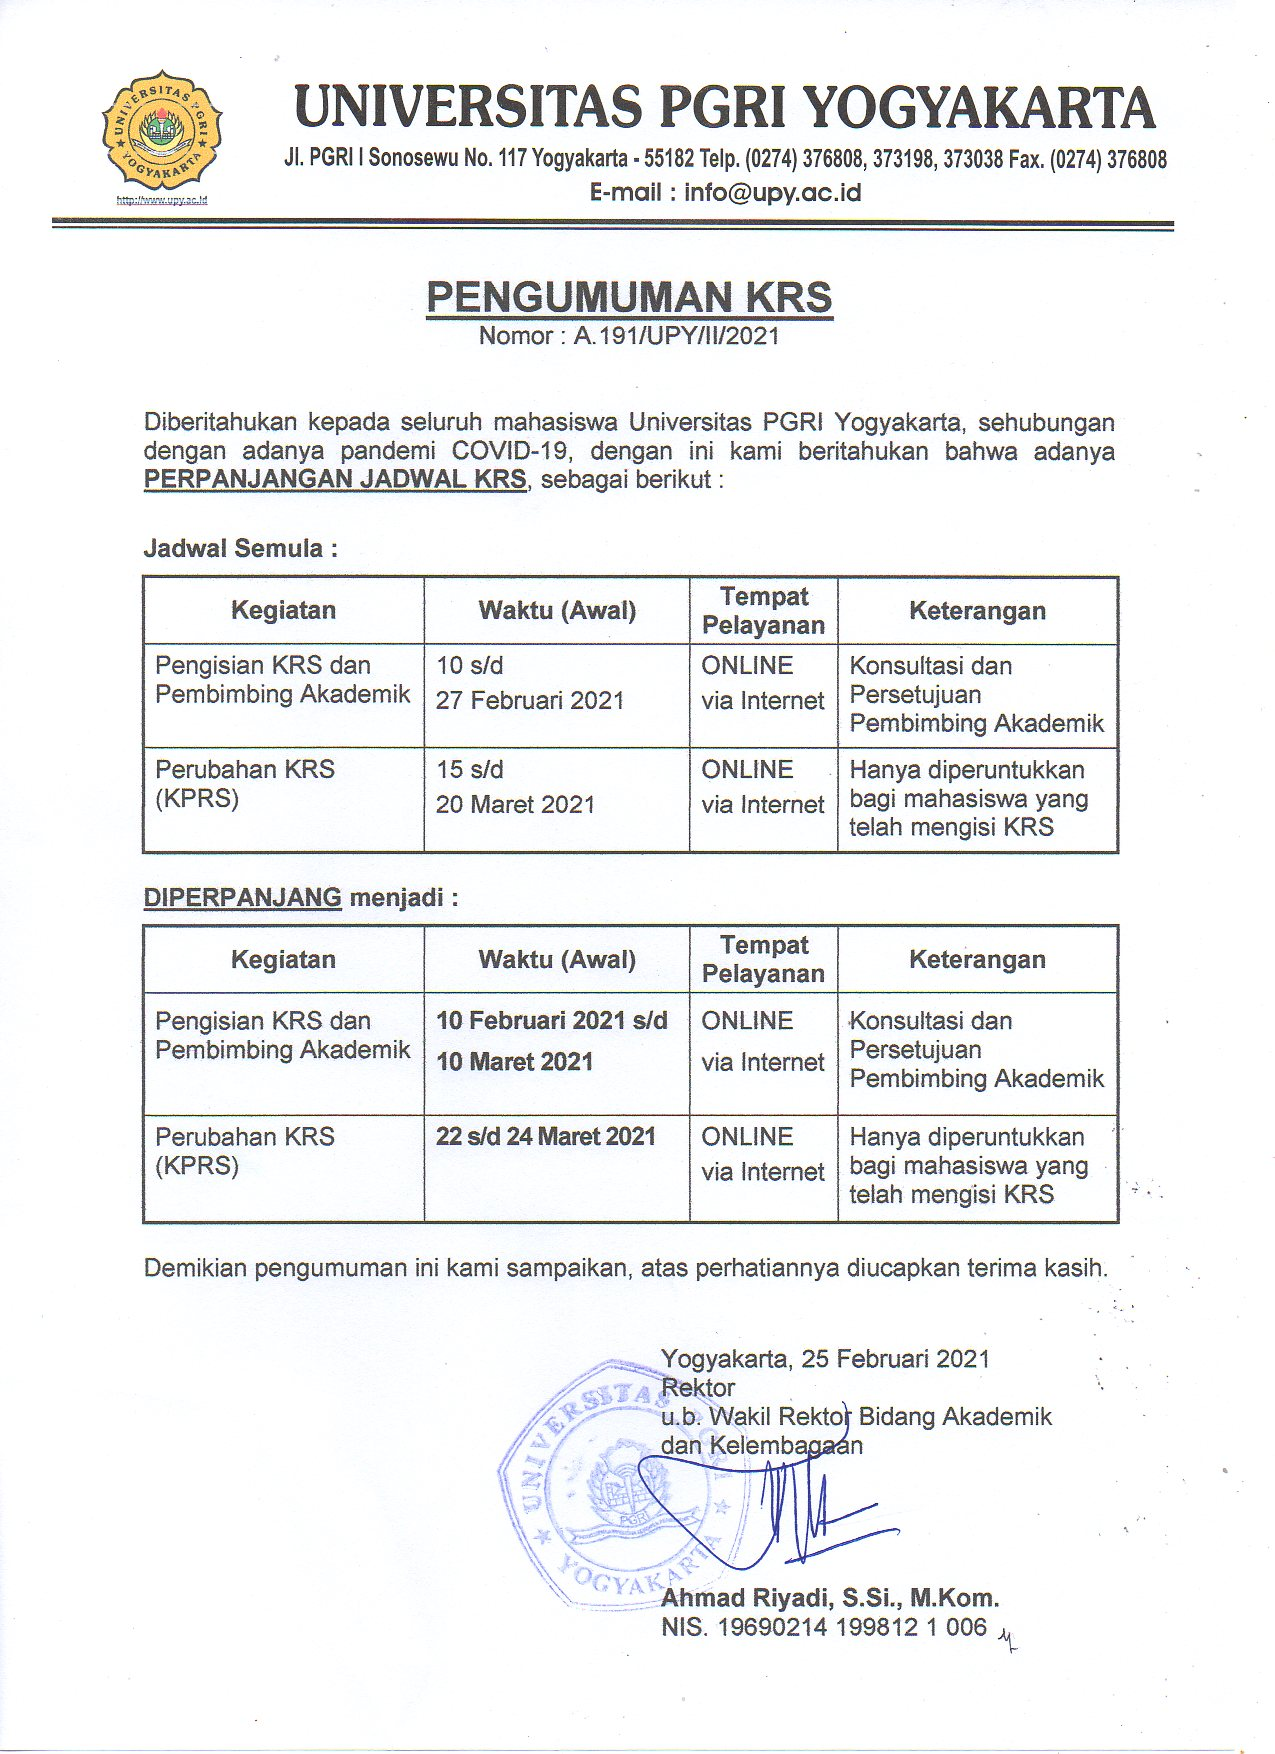 Pengumuman Perpanjangan KRS Semester Genap Tahun Akademik 2020/2021